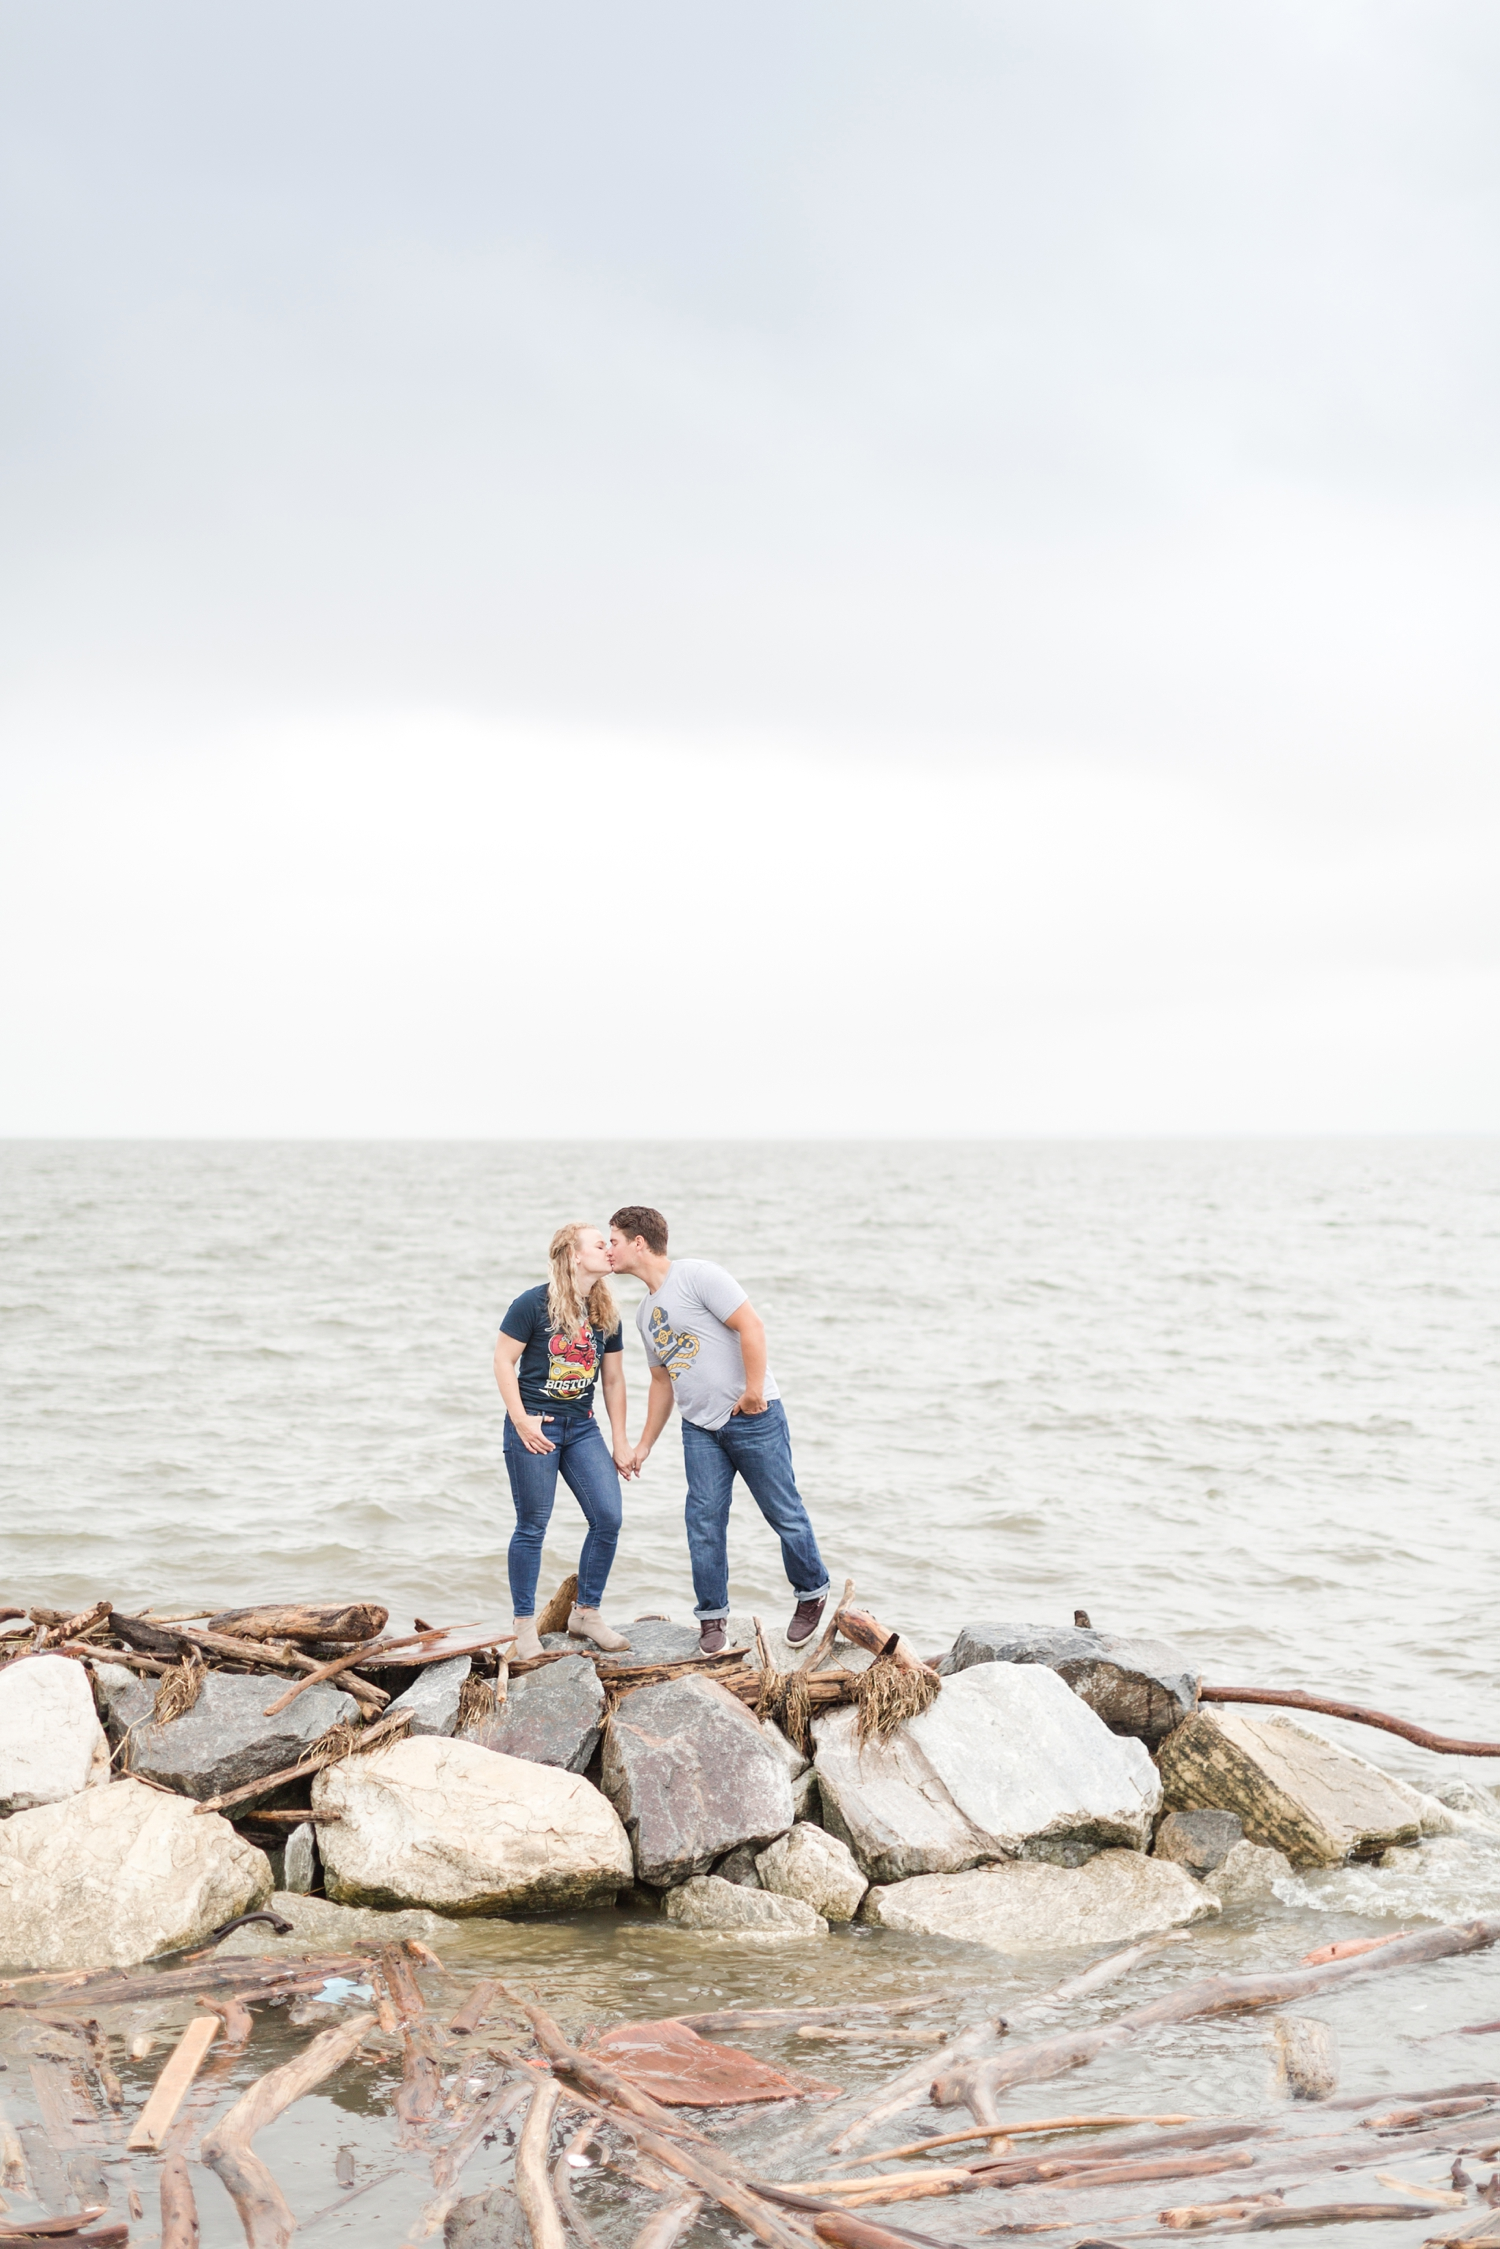 Kirsten & Dan Engagement-218_North-Point-State-Park-Engagement-Maryland-engagement-wedding-photographer-anna-grace-photography-photo.jpg